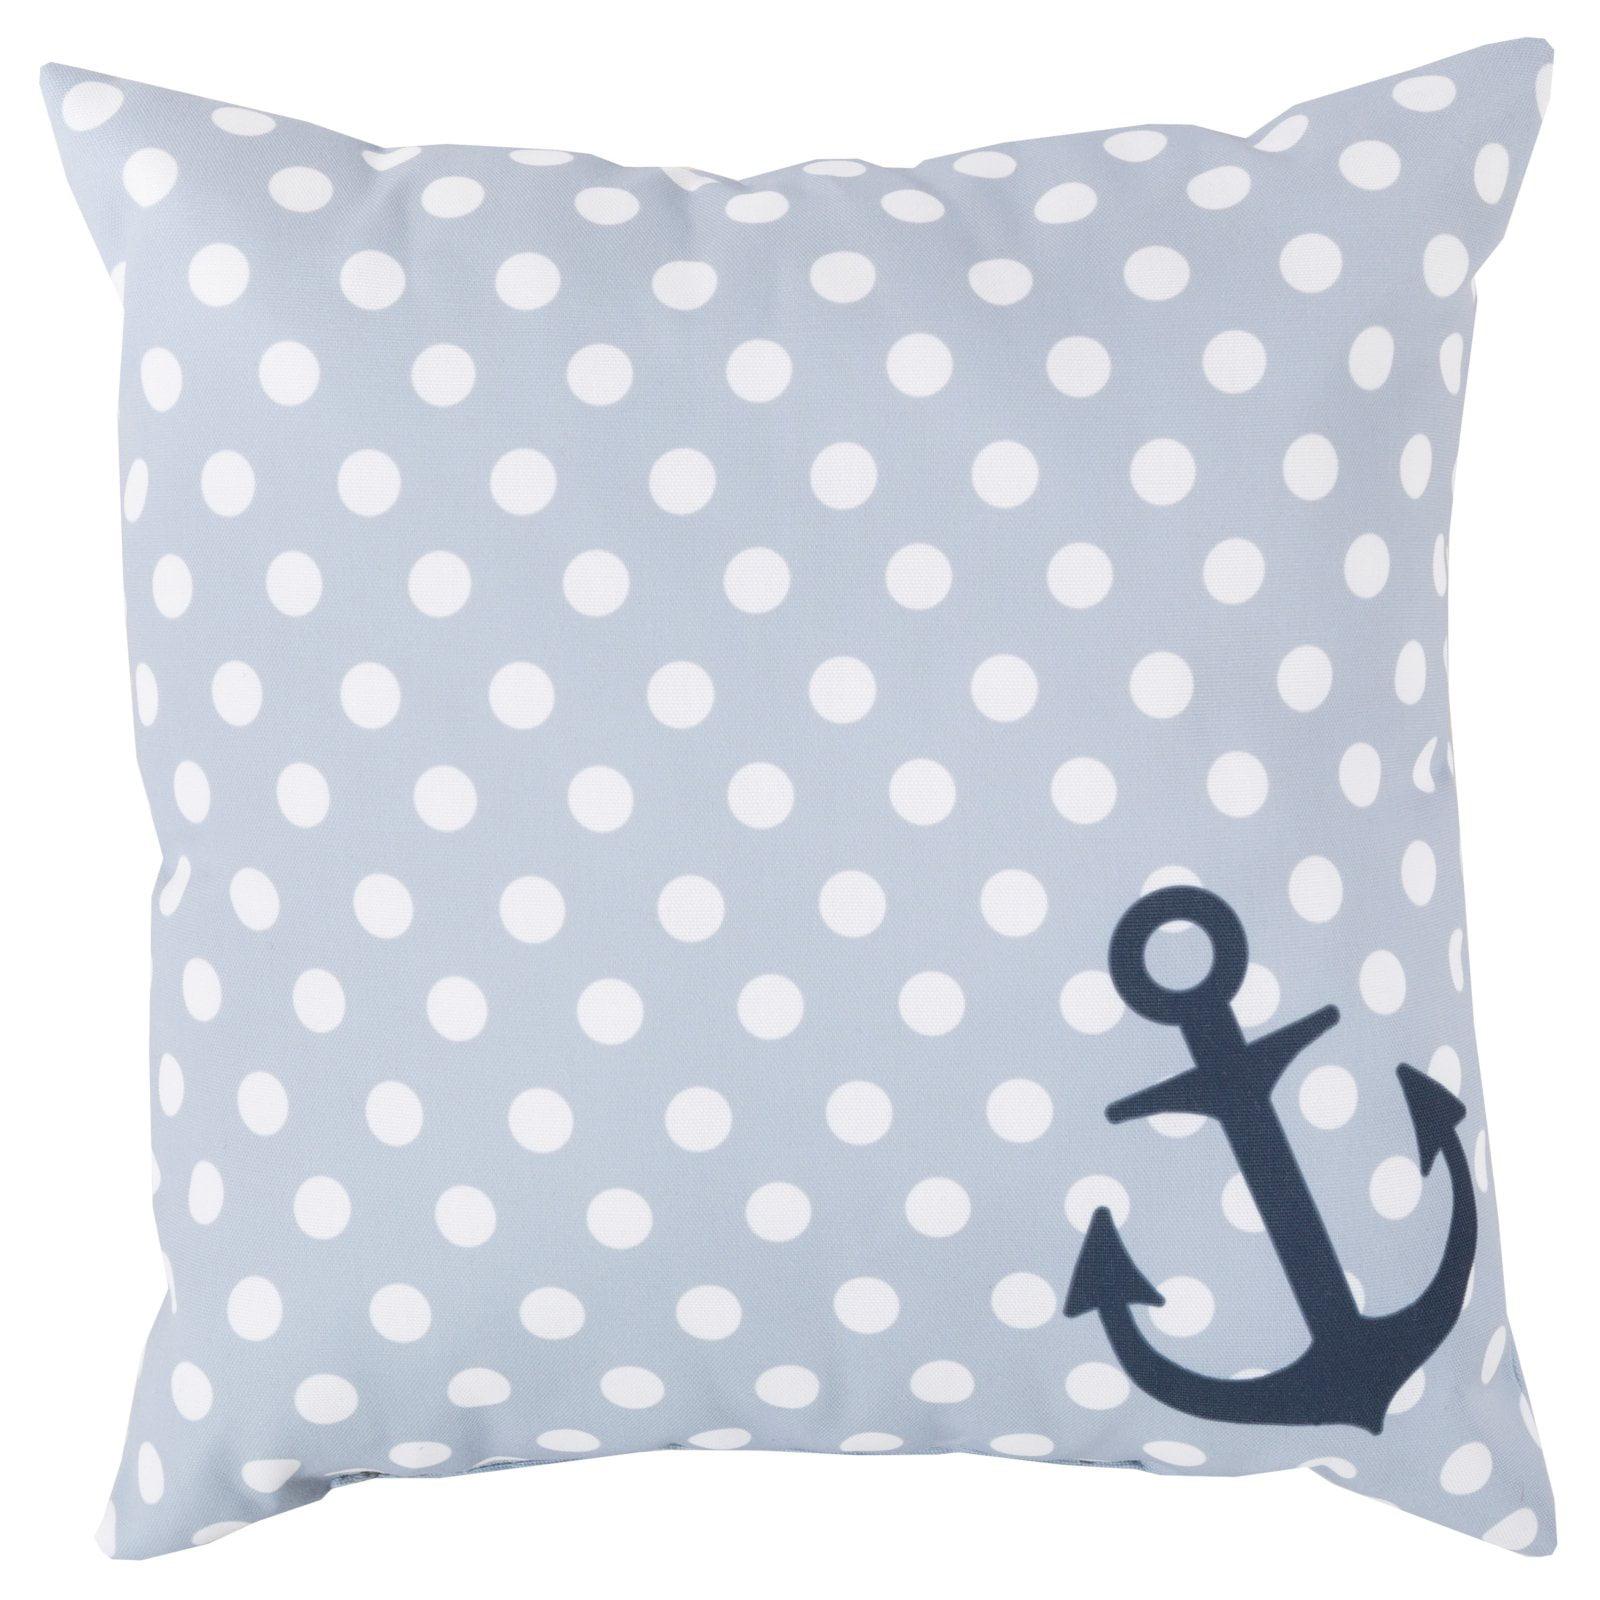 Surya Anchored in Polka Dots Indoor/Outdoor Pillow